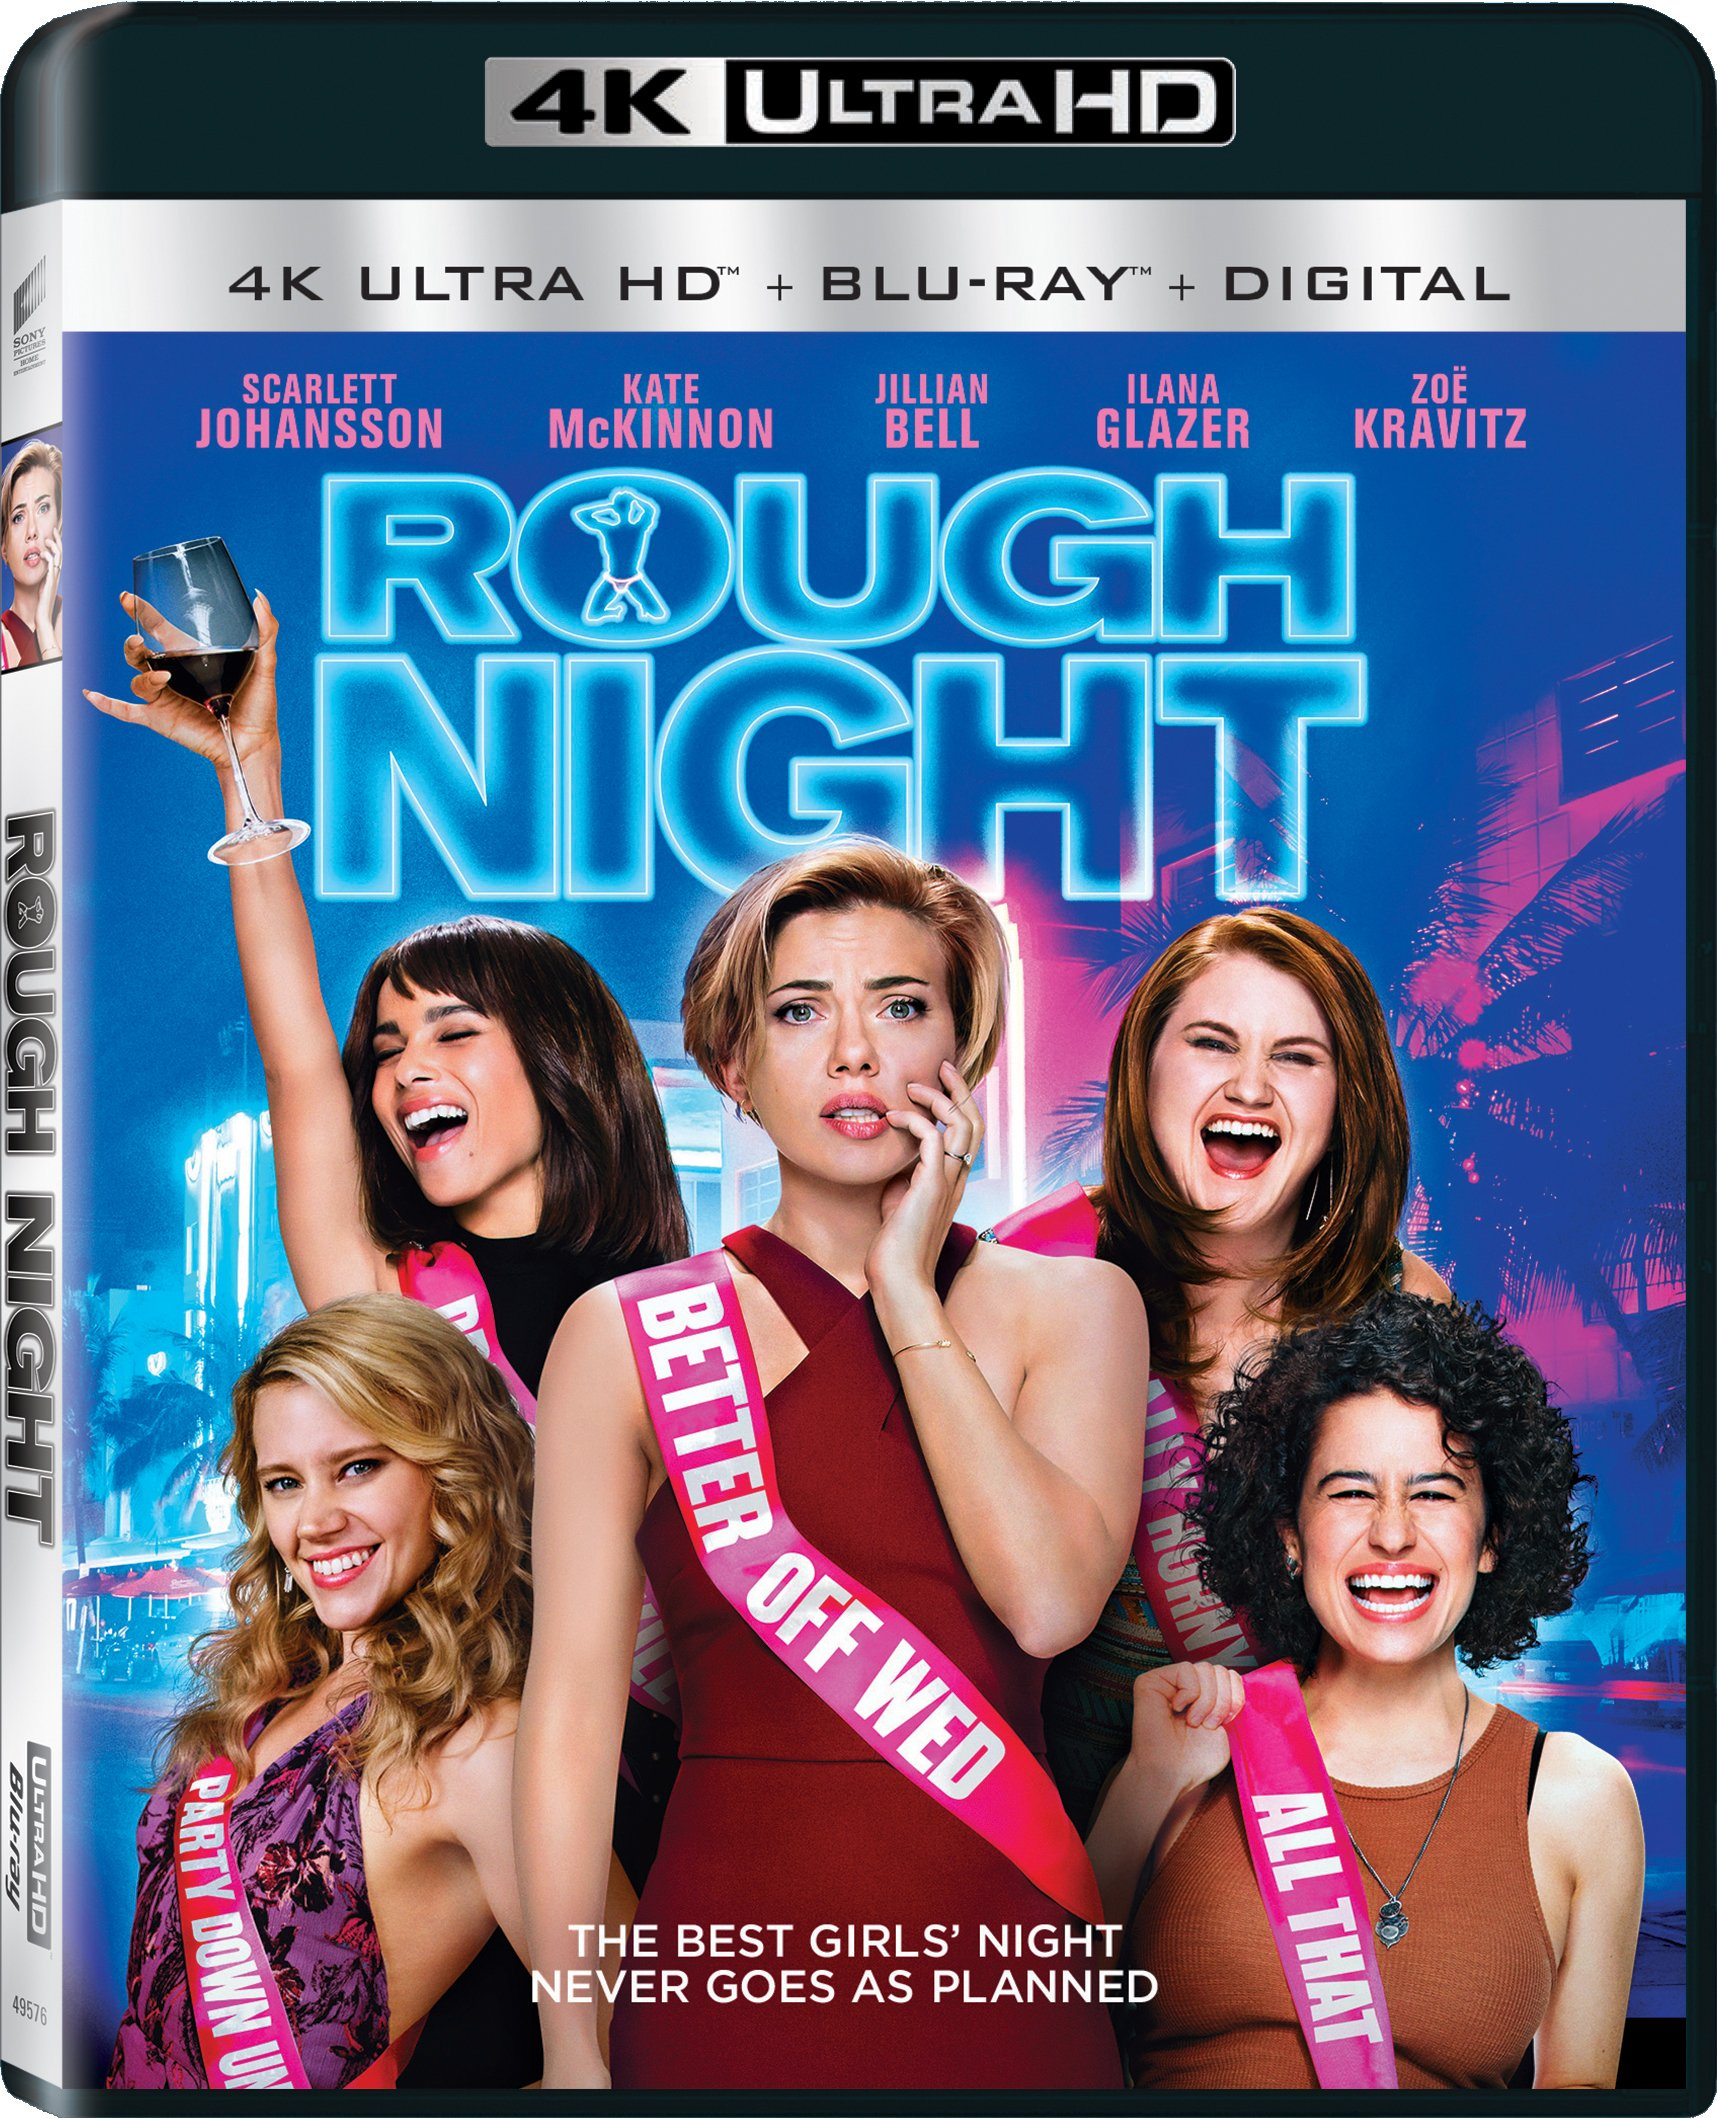 4K Blu-ray : Rough Night (With Blu-Ray, Ultraviolet Digital Copy, 4K Mastering, Widescreen, )